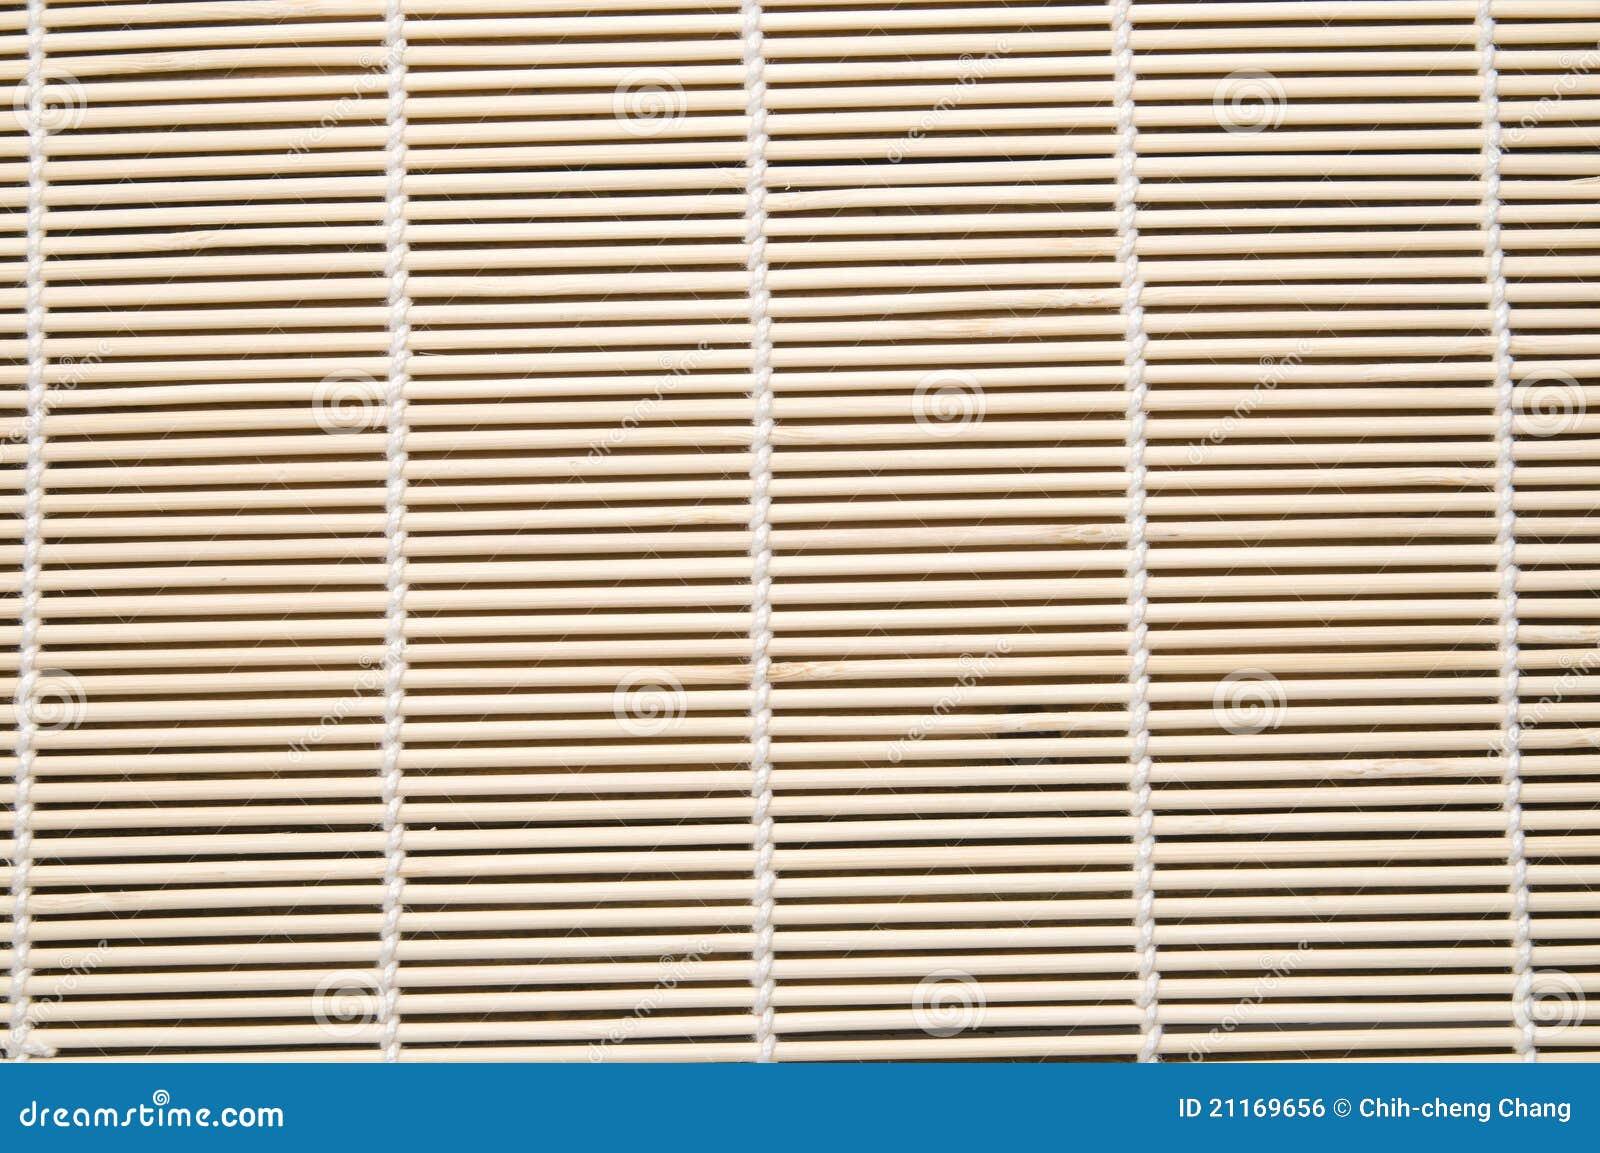 Cortina de bambu imagem de stock royalty free imagem - Cortina de bambu ...